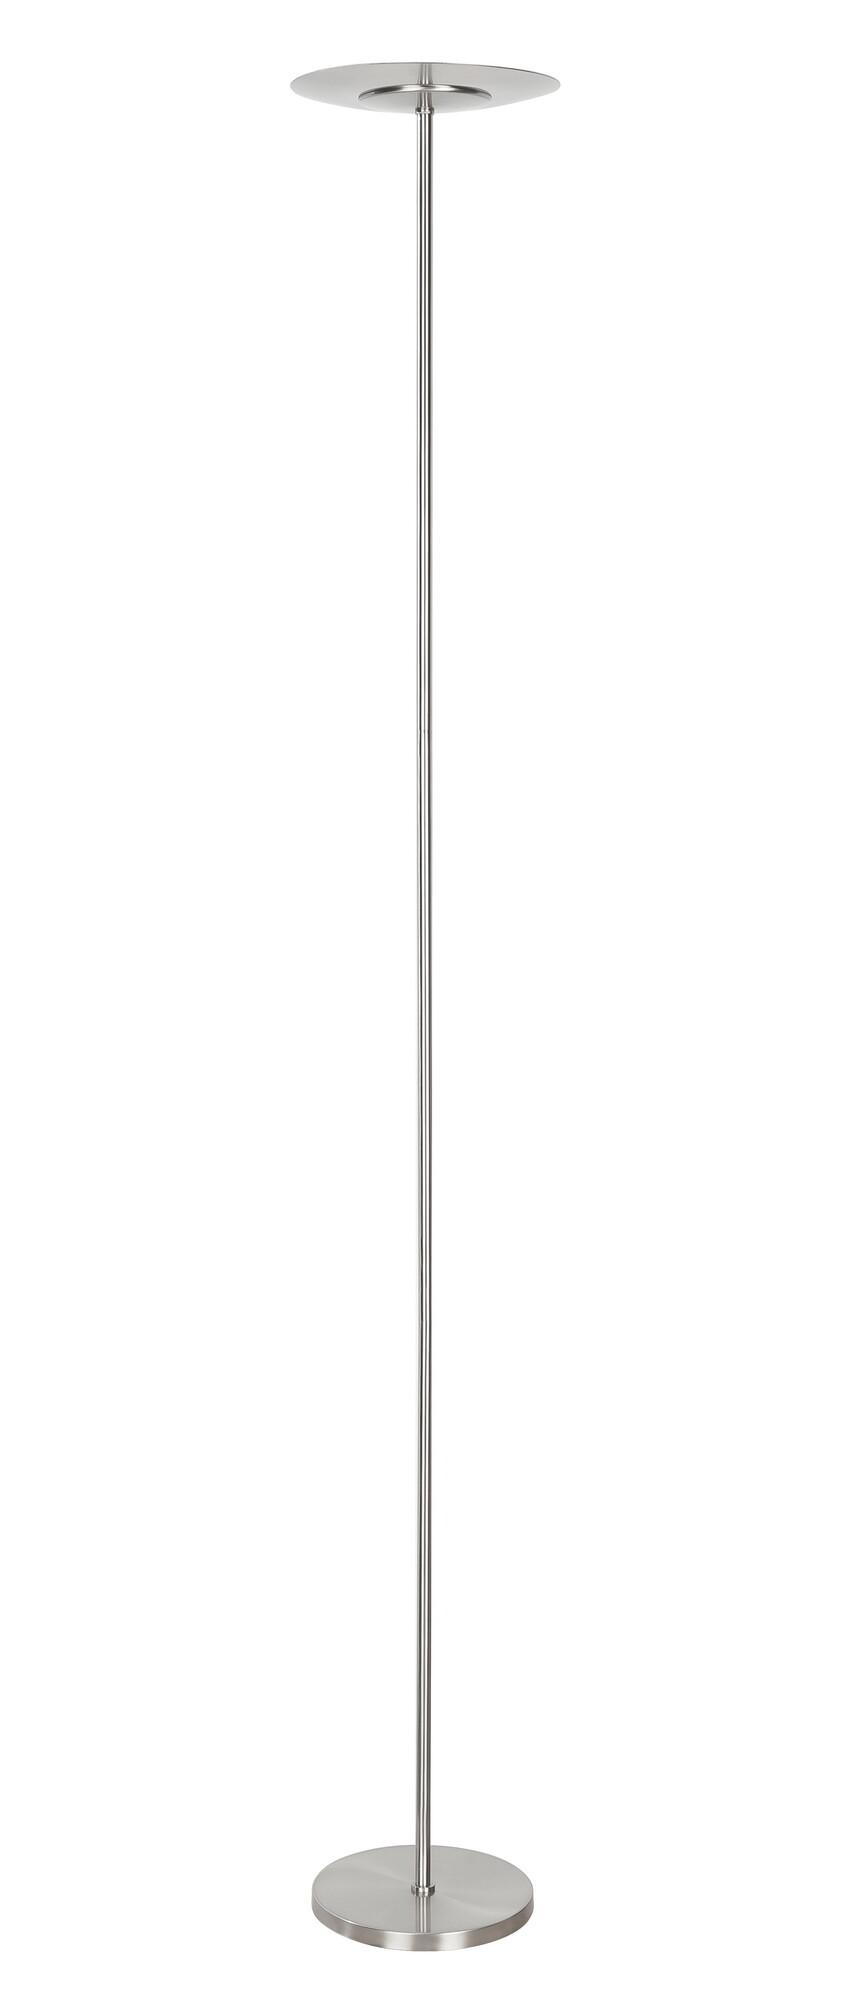 OSAKA Vloerlamp LED 1x24W/1800lm Zilver